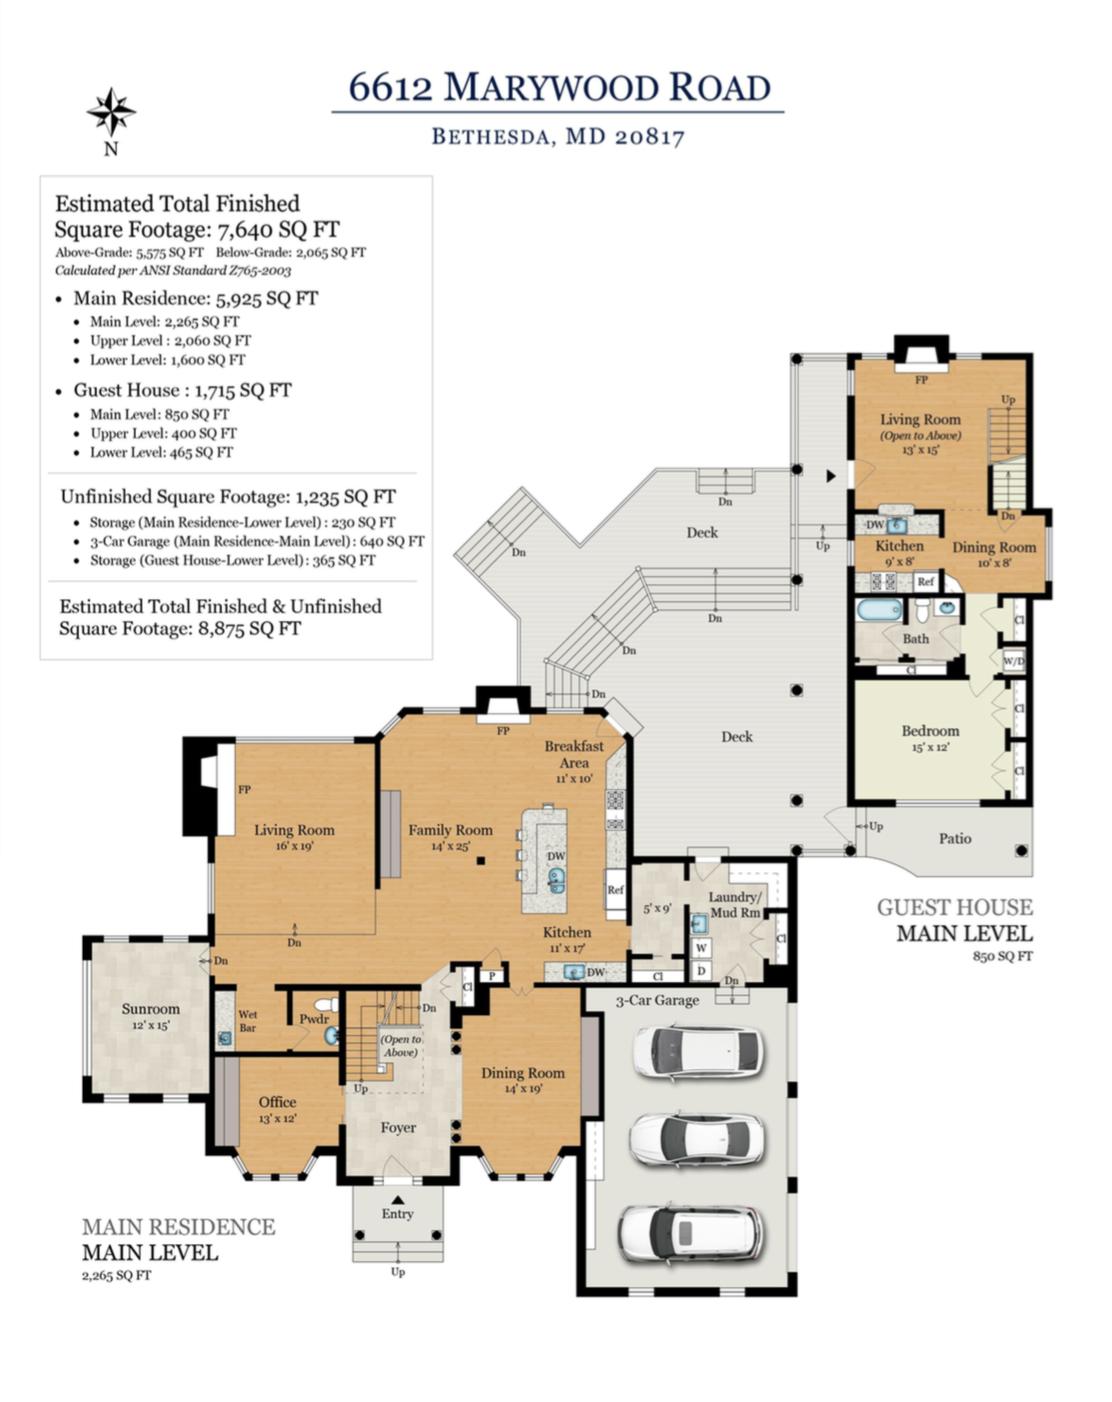 6612 Marywood - Bethesda - Main Level Floor Plans